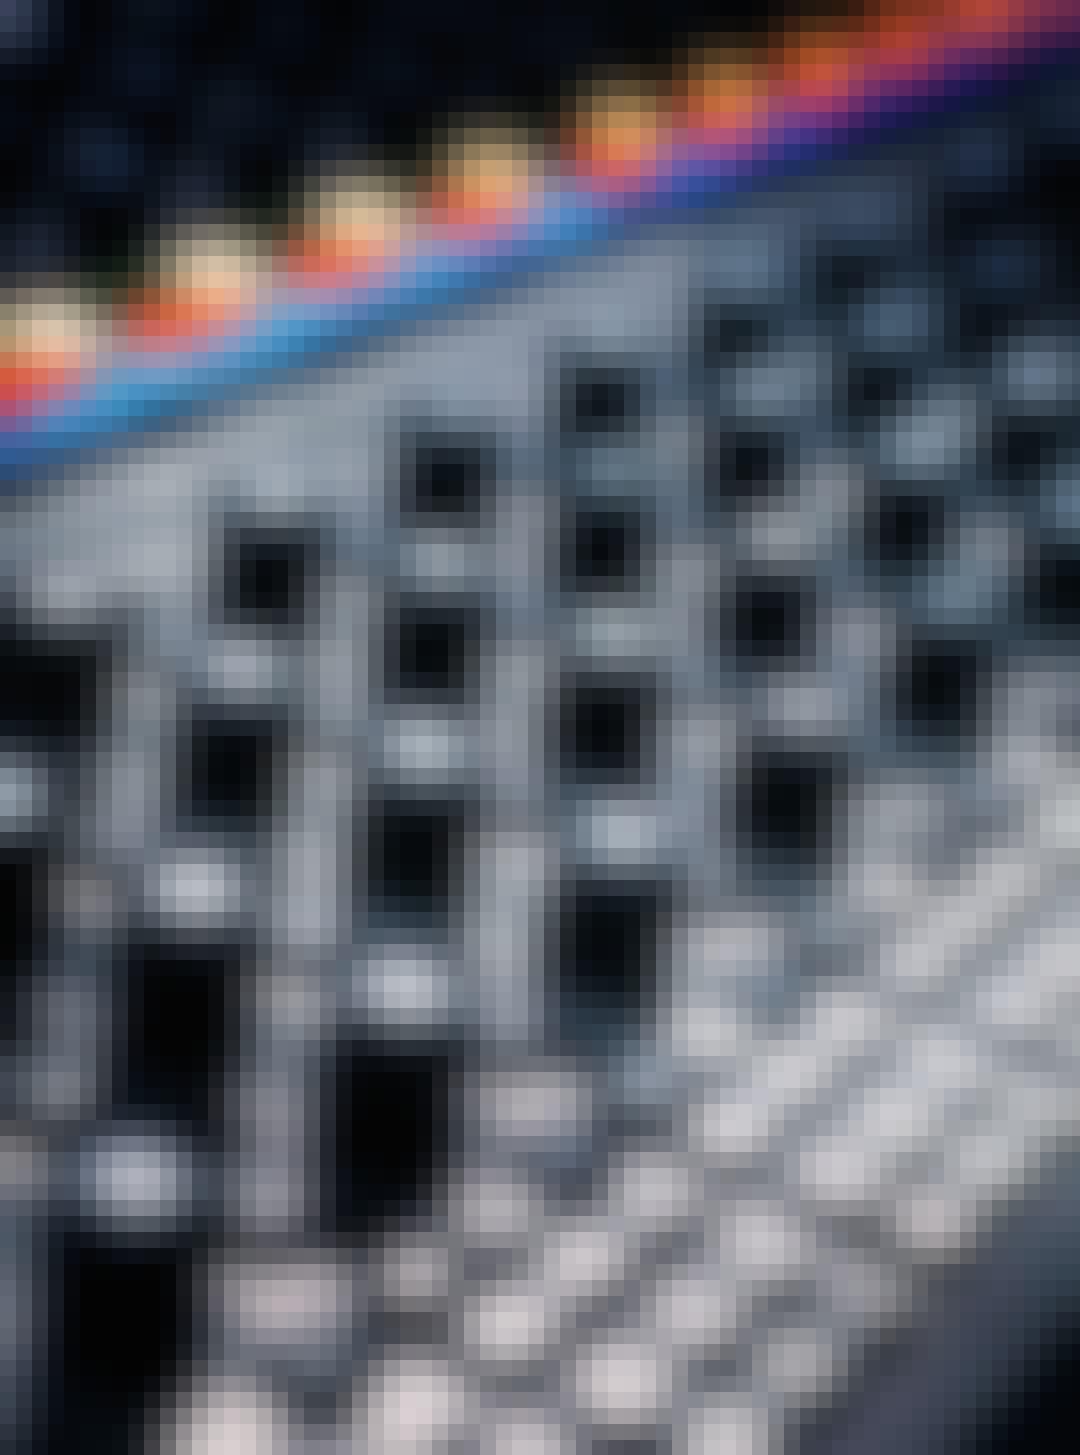 sound engineering keyboard, sound equipment, editing bay